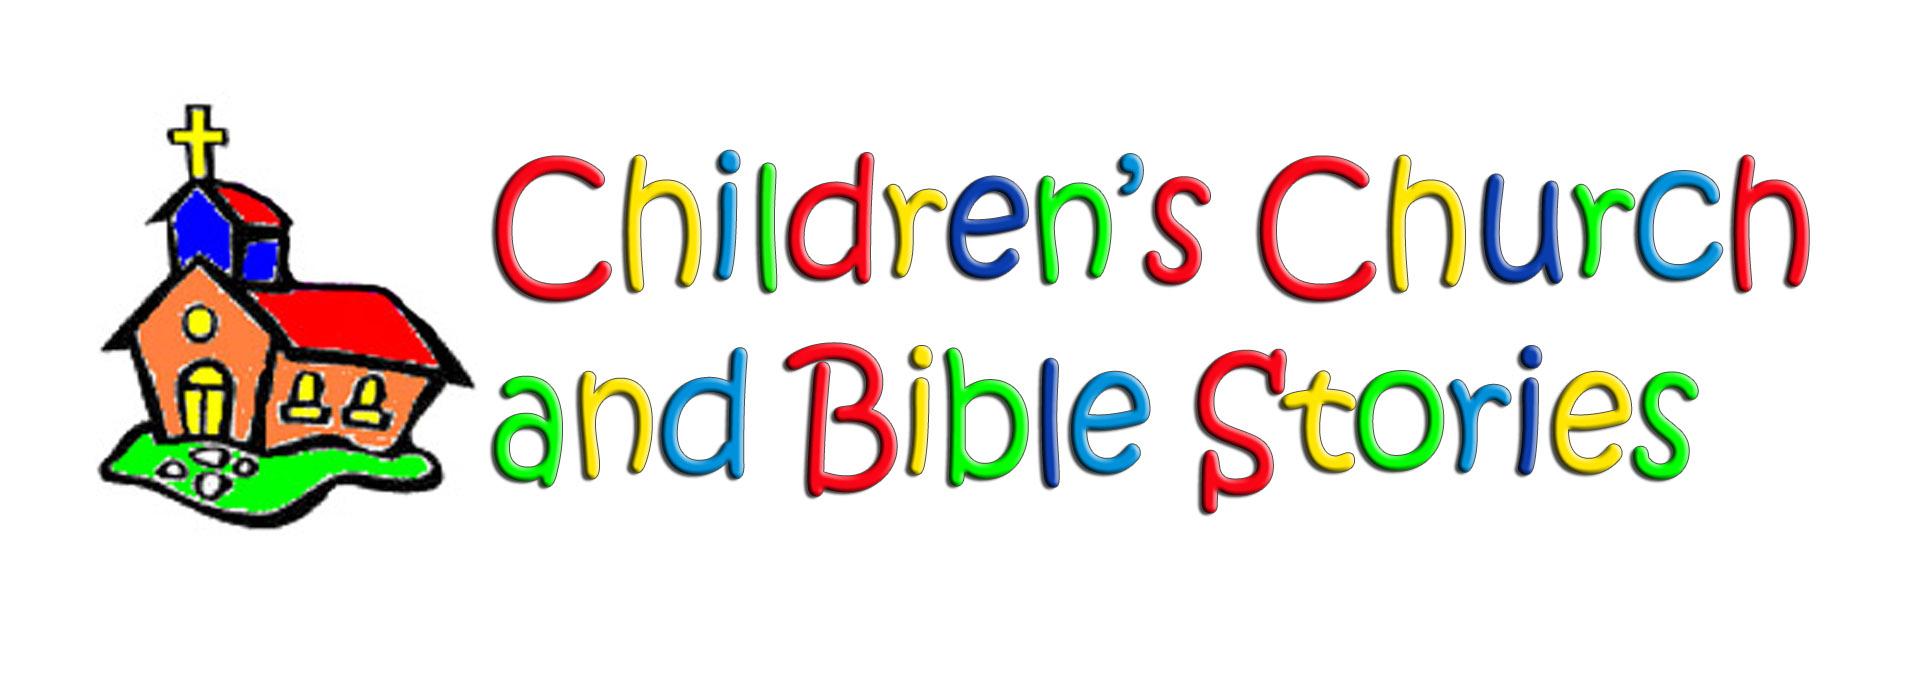 Children's Church - Pine Shores Presbyterian Church (USA)